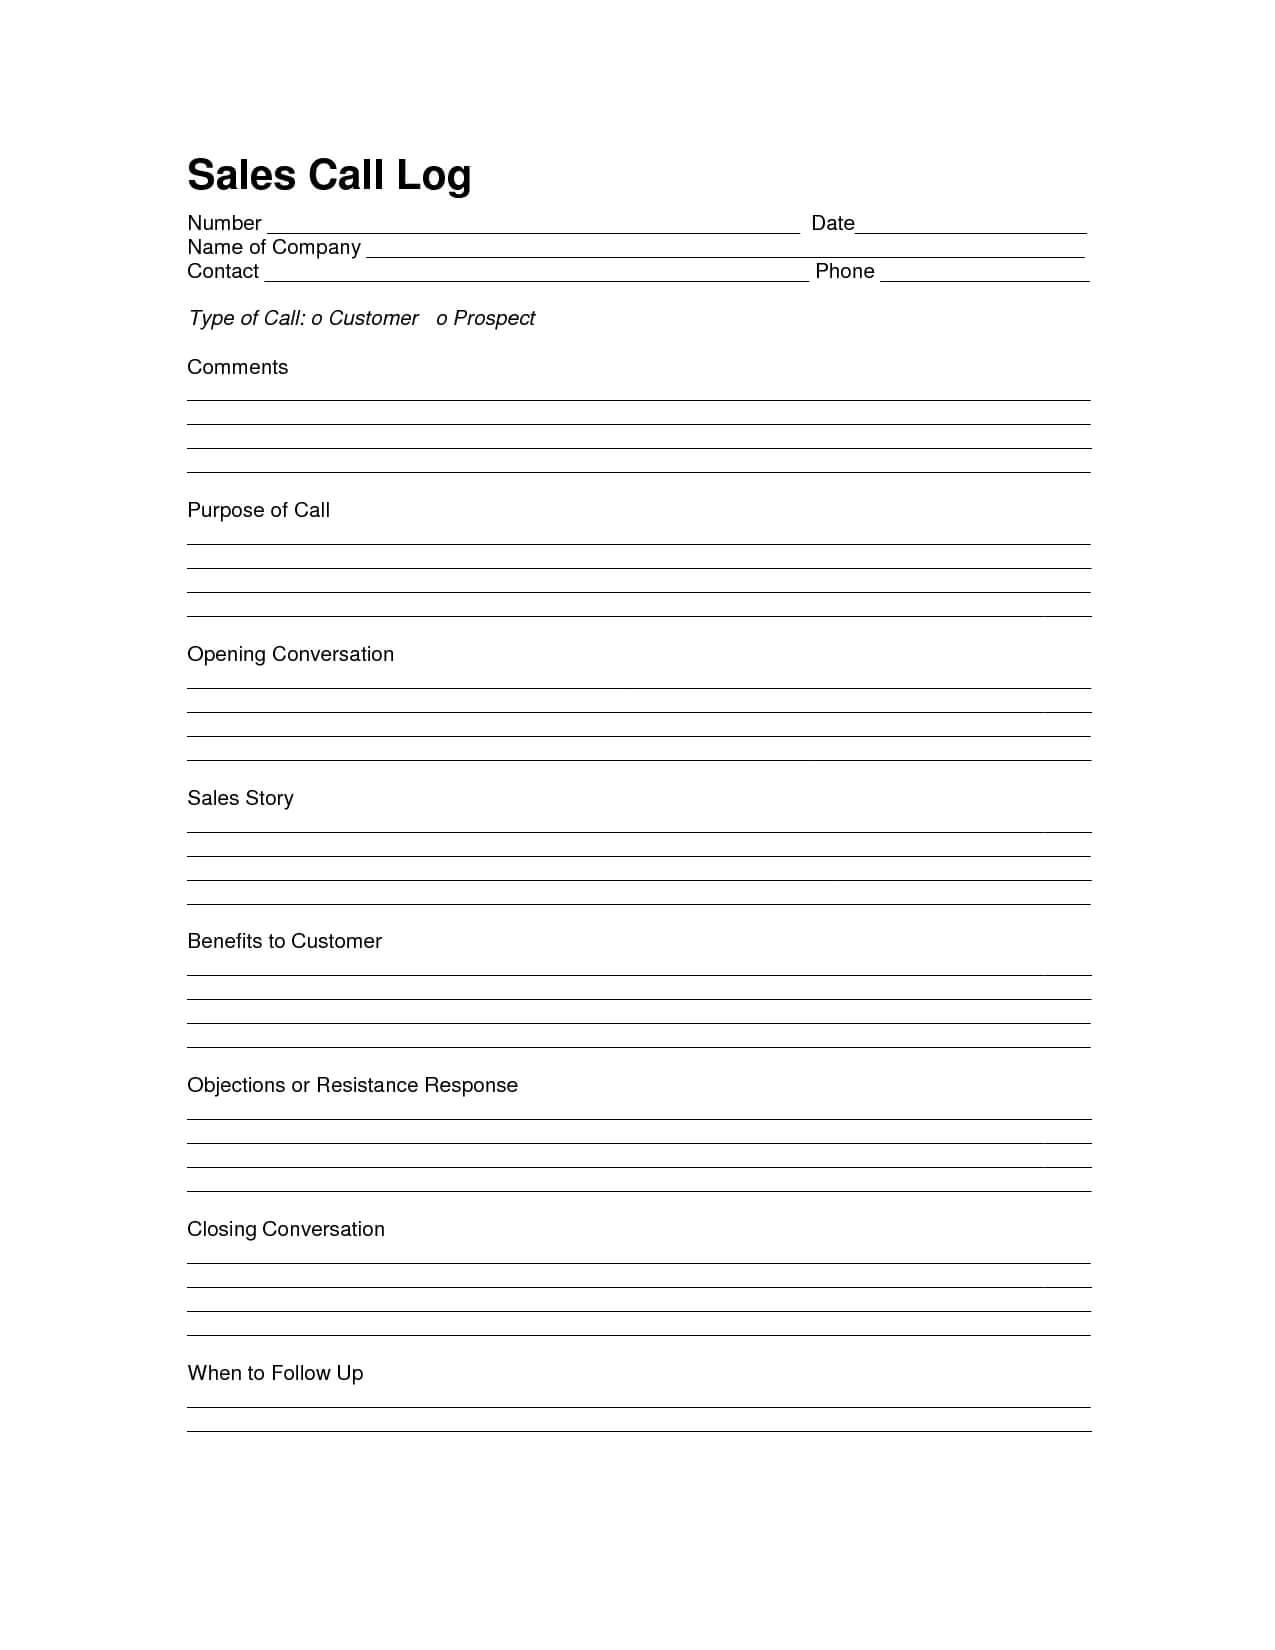 Sales Log Sheet Template | Sales Call Log Template | Sales Throughout Sales Call Reports Templates Free